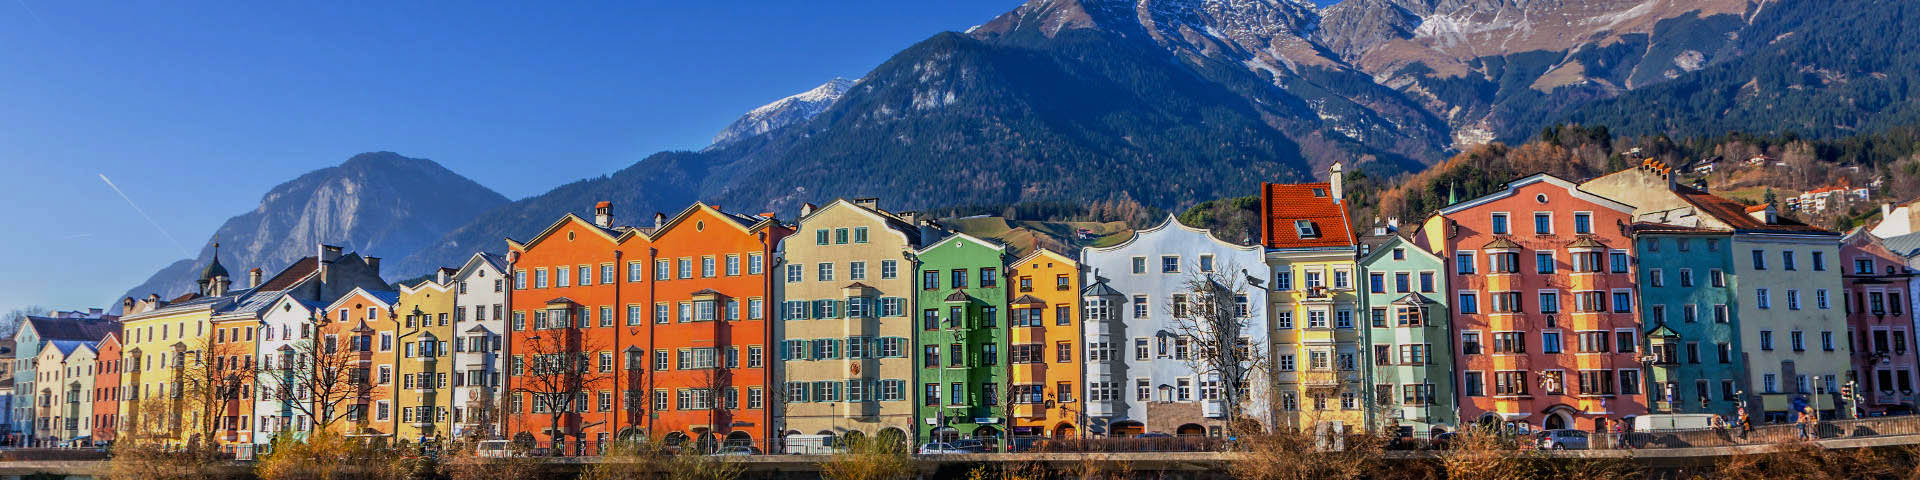 Innsbruck hero skyline edit